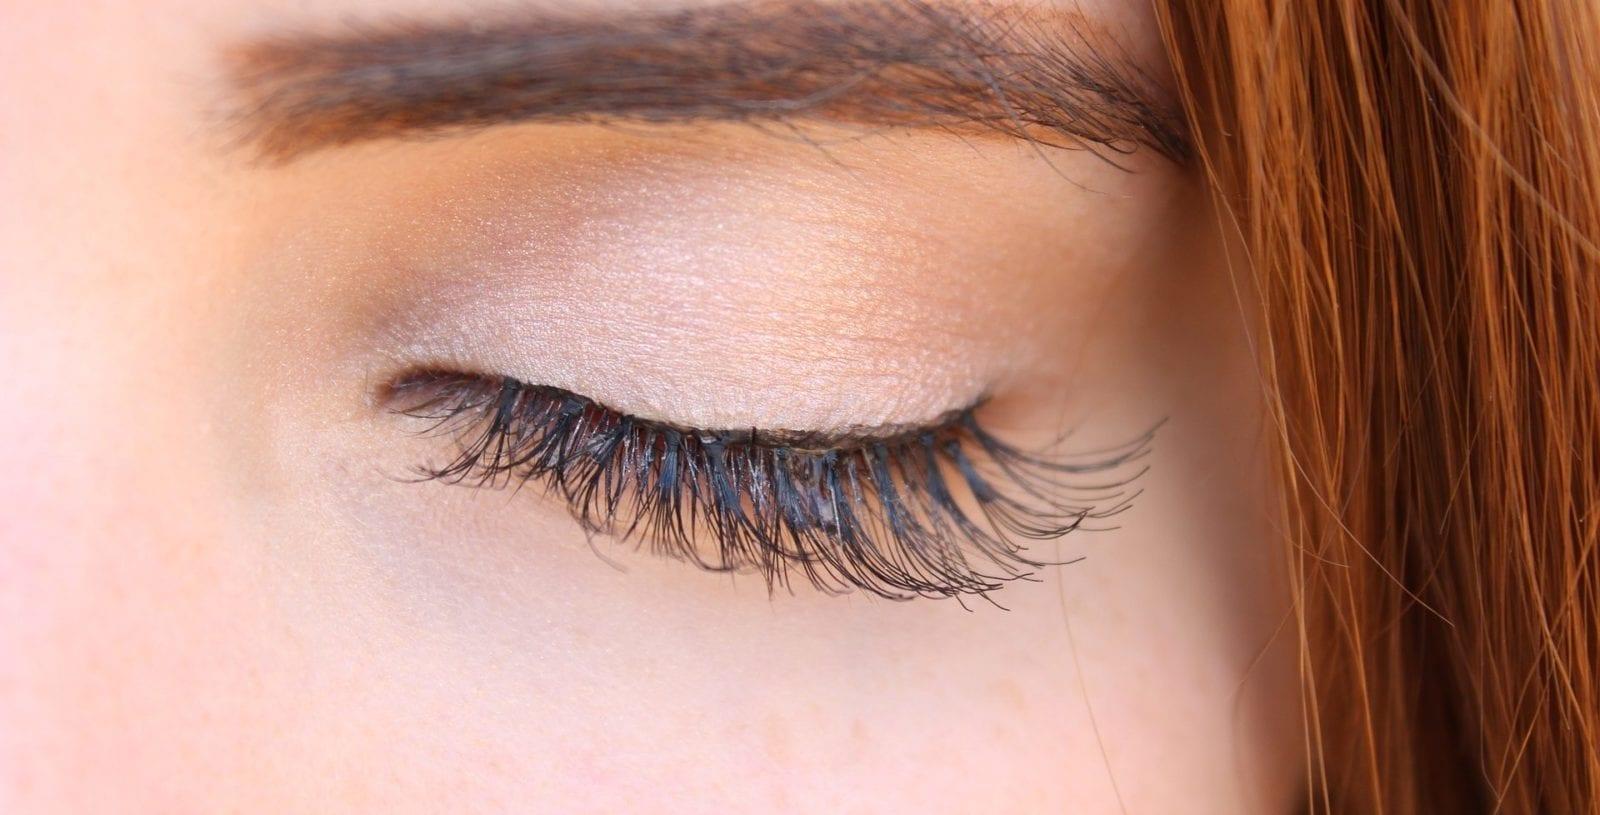 Wimpern - Kosmetik Artemania Fehraltorf - Nail Art - Beauty und Care 1